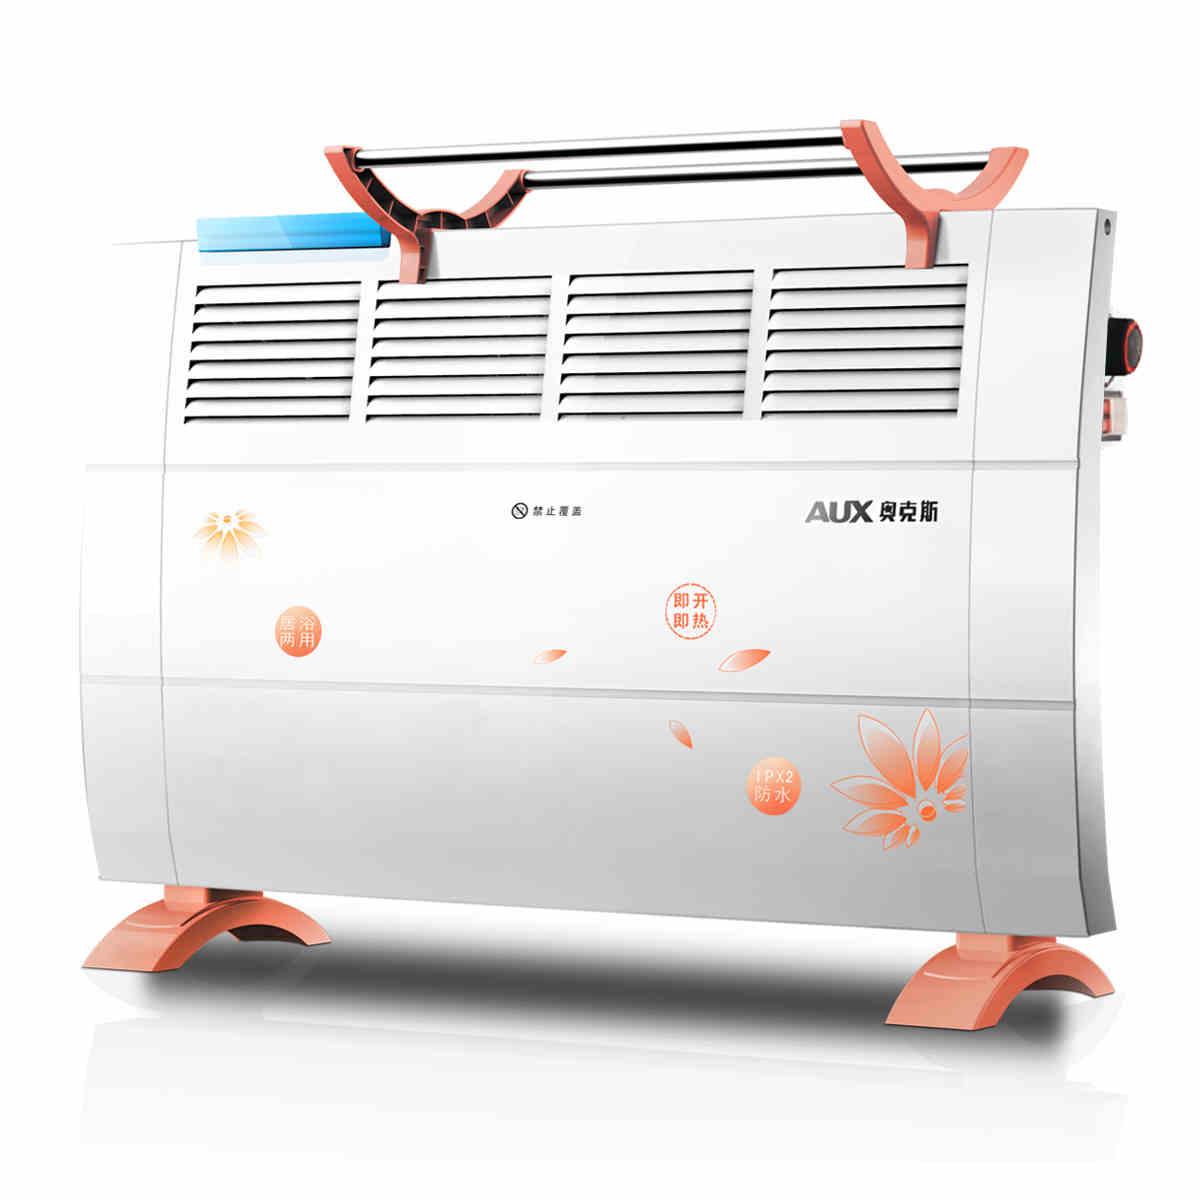 Free shipping Household electric heater bathroom office waterproof energy-saving KaoHuoLu(China (Mainland))